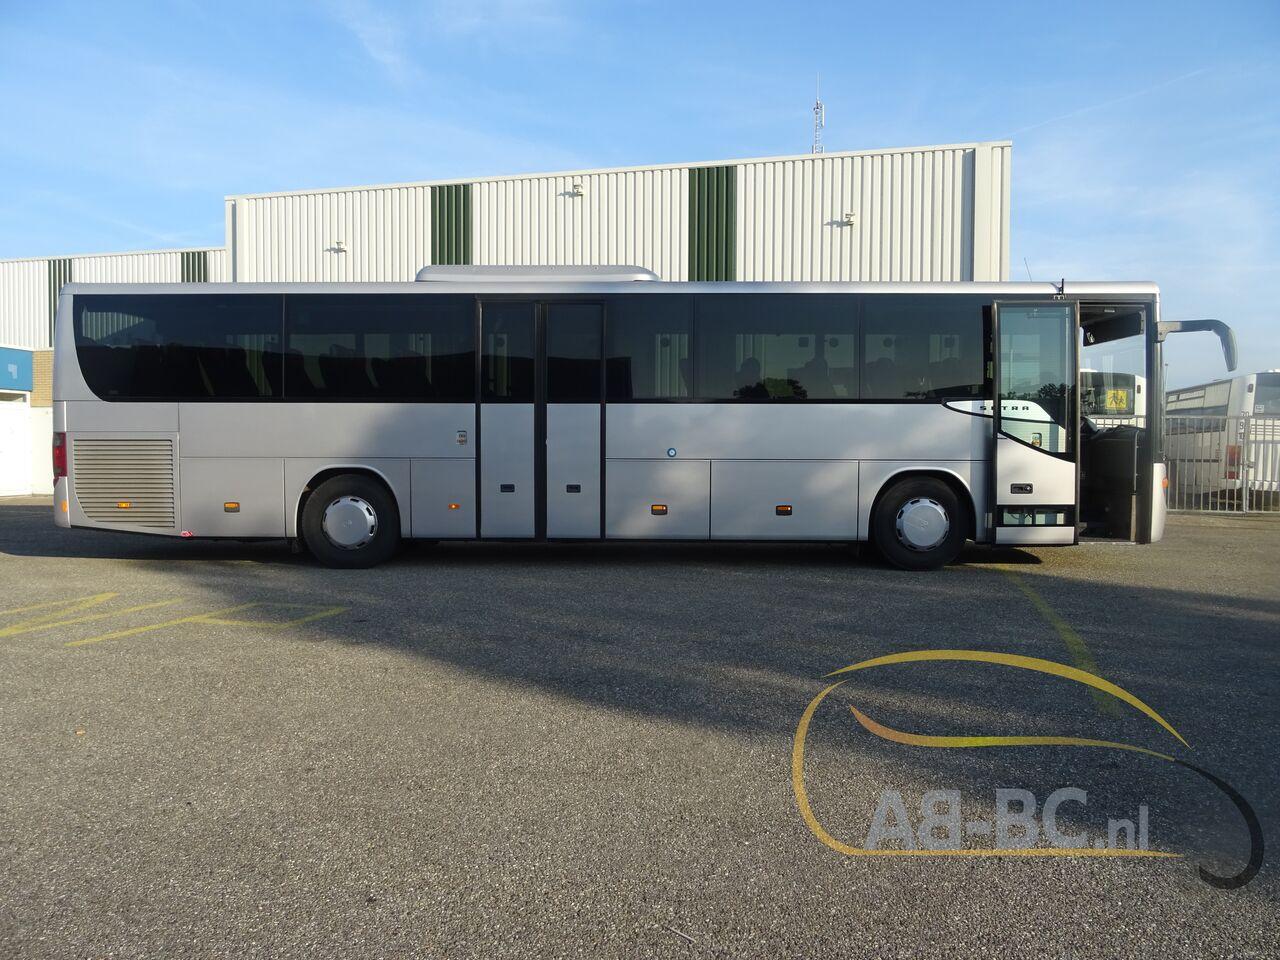 coach-bus-SETRA-S415H-52-Seats-EURO-6-Liftbus---1630913178886173577_big_3b5db3b91e4dba581d73eacd3016ad1d--21070517141280735500